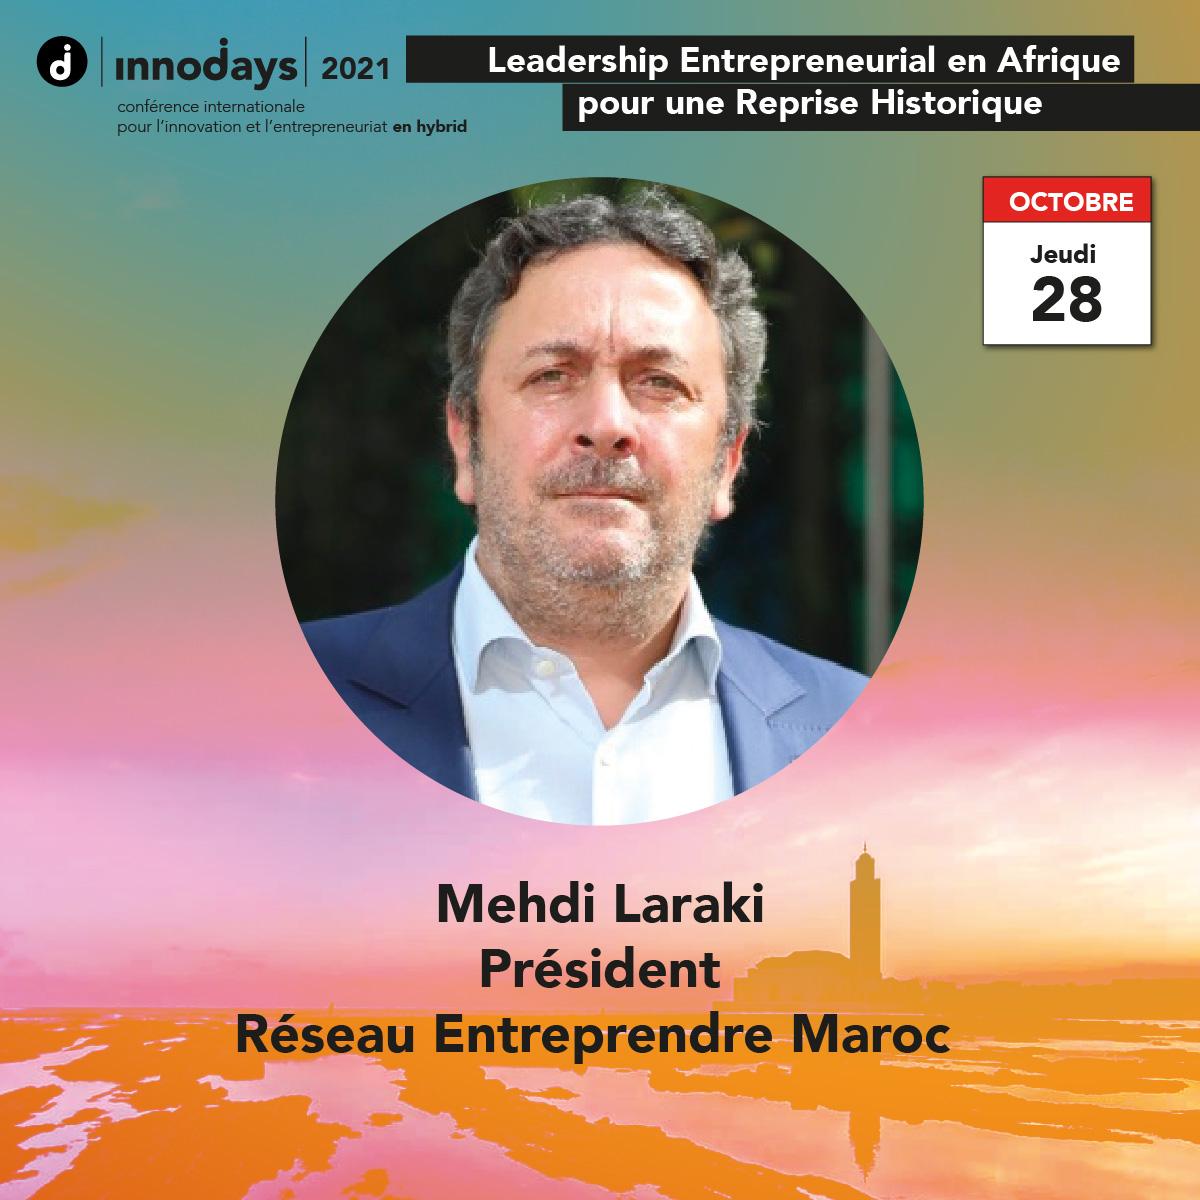 Mehdi Laraki - Président - Réseau Entreprendre Maroc